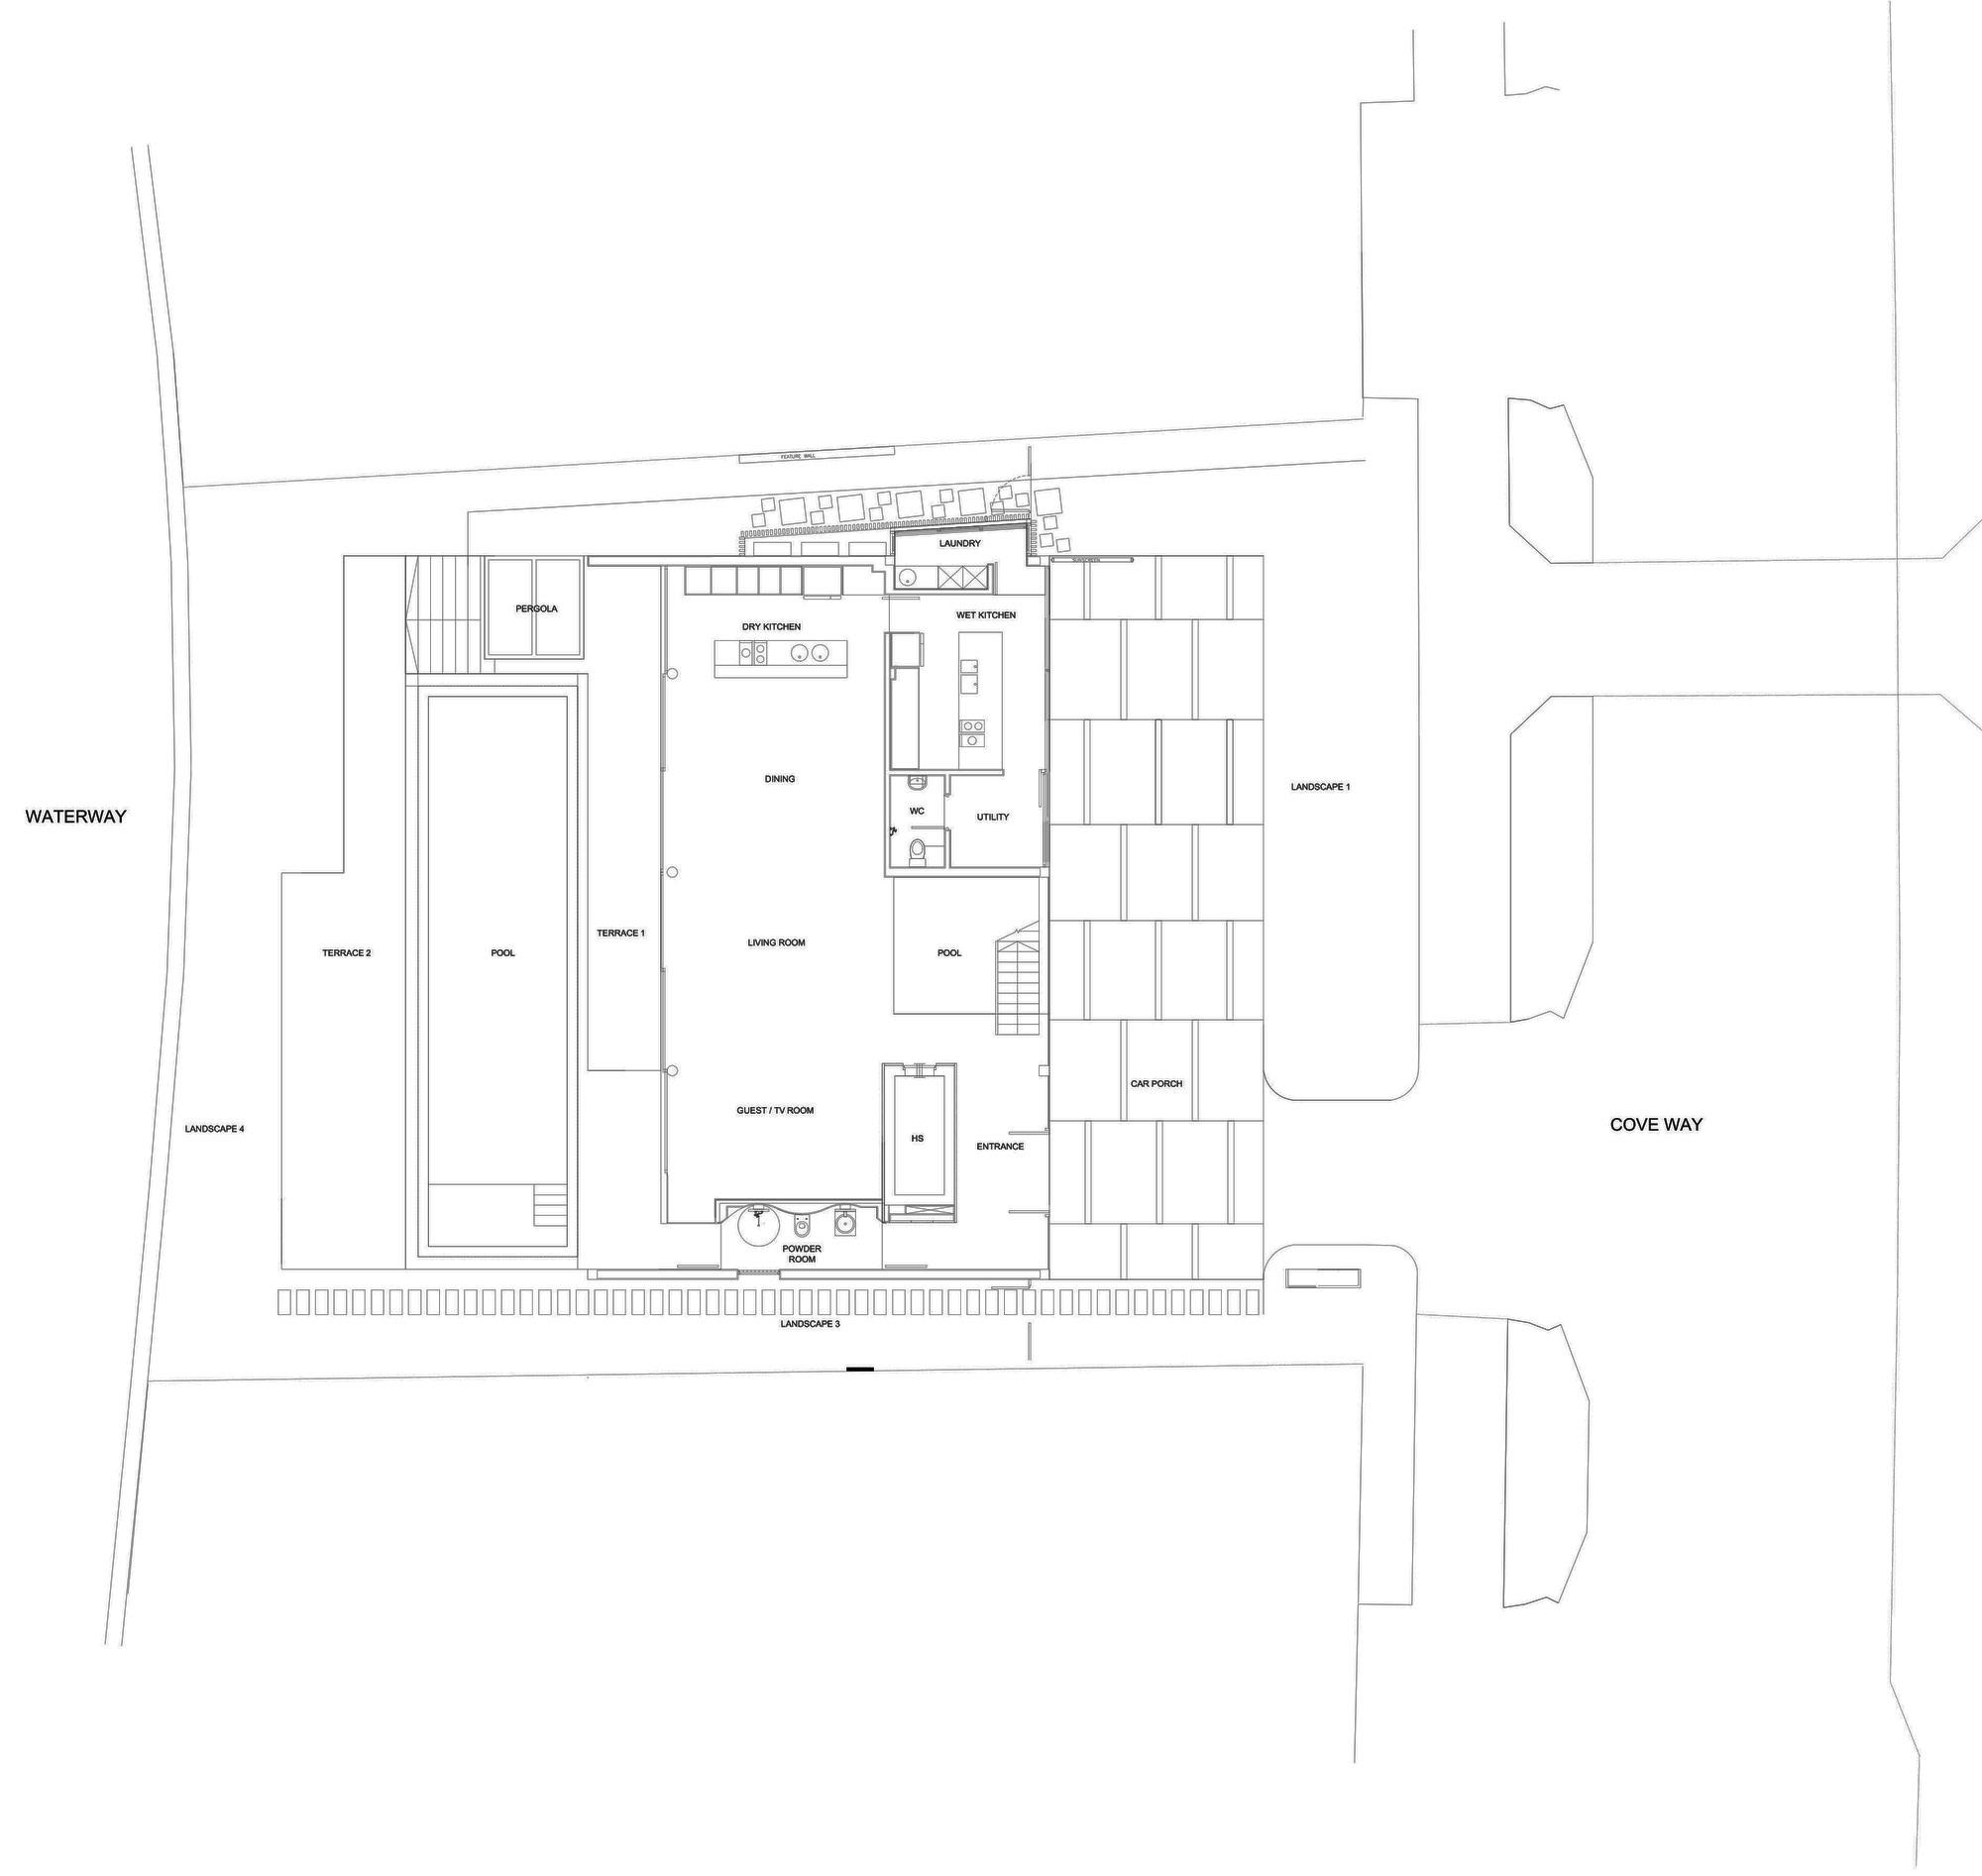 Ground Floor Plan, Minimalist Contemporary Home in Singapore